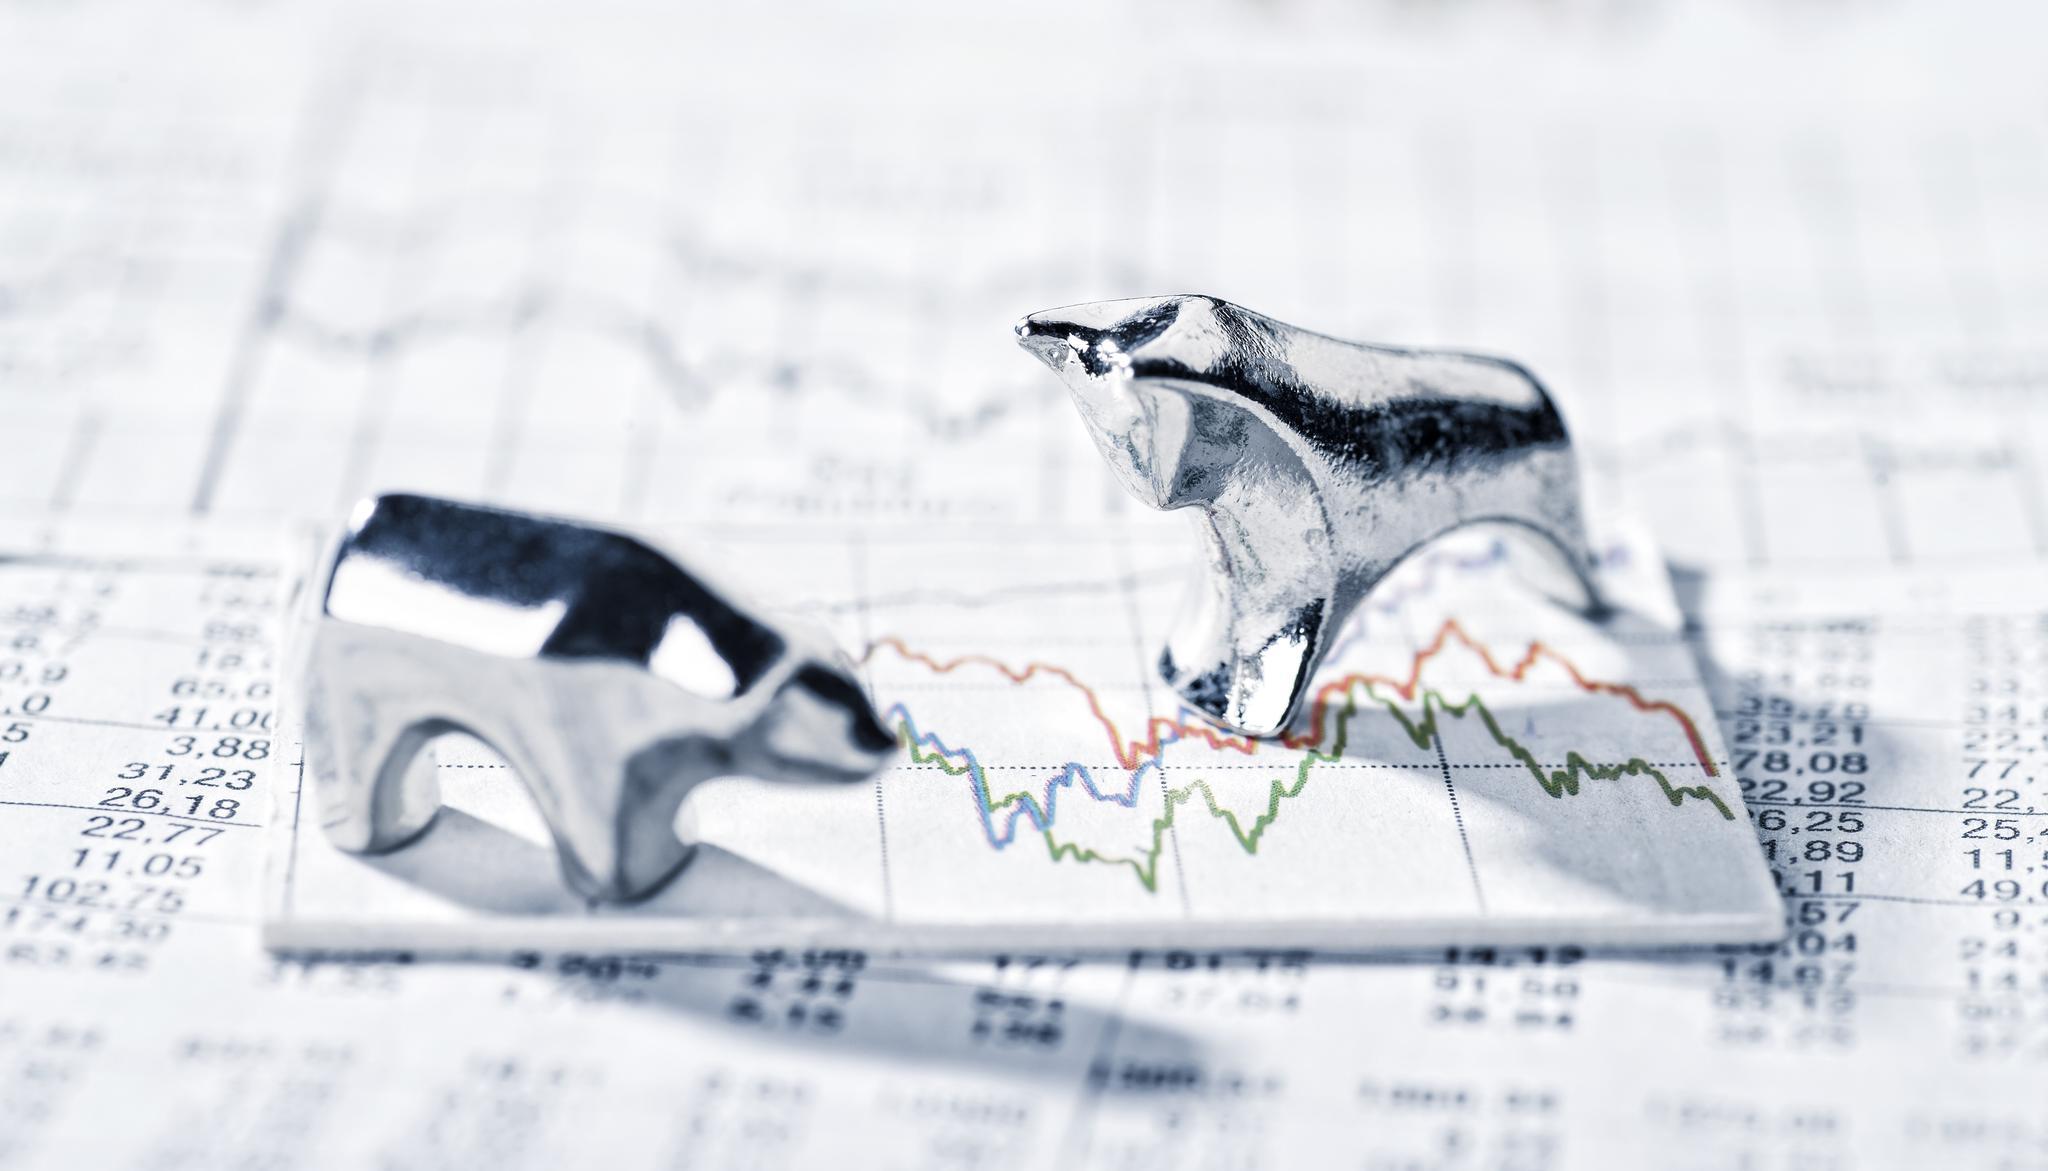 Metallfiguren Bulle und Bär auf Ausdrucken von Börsenkursen